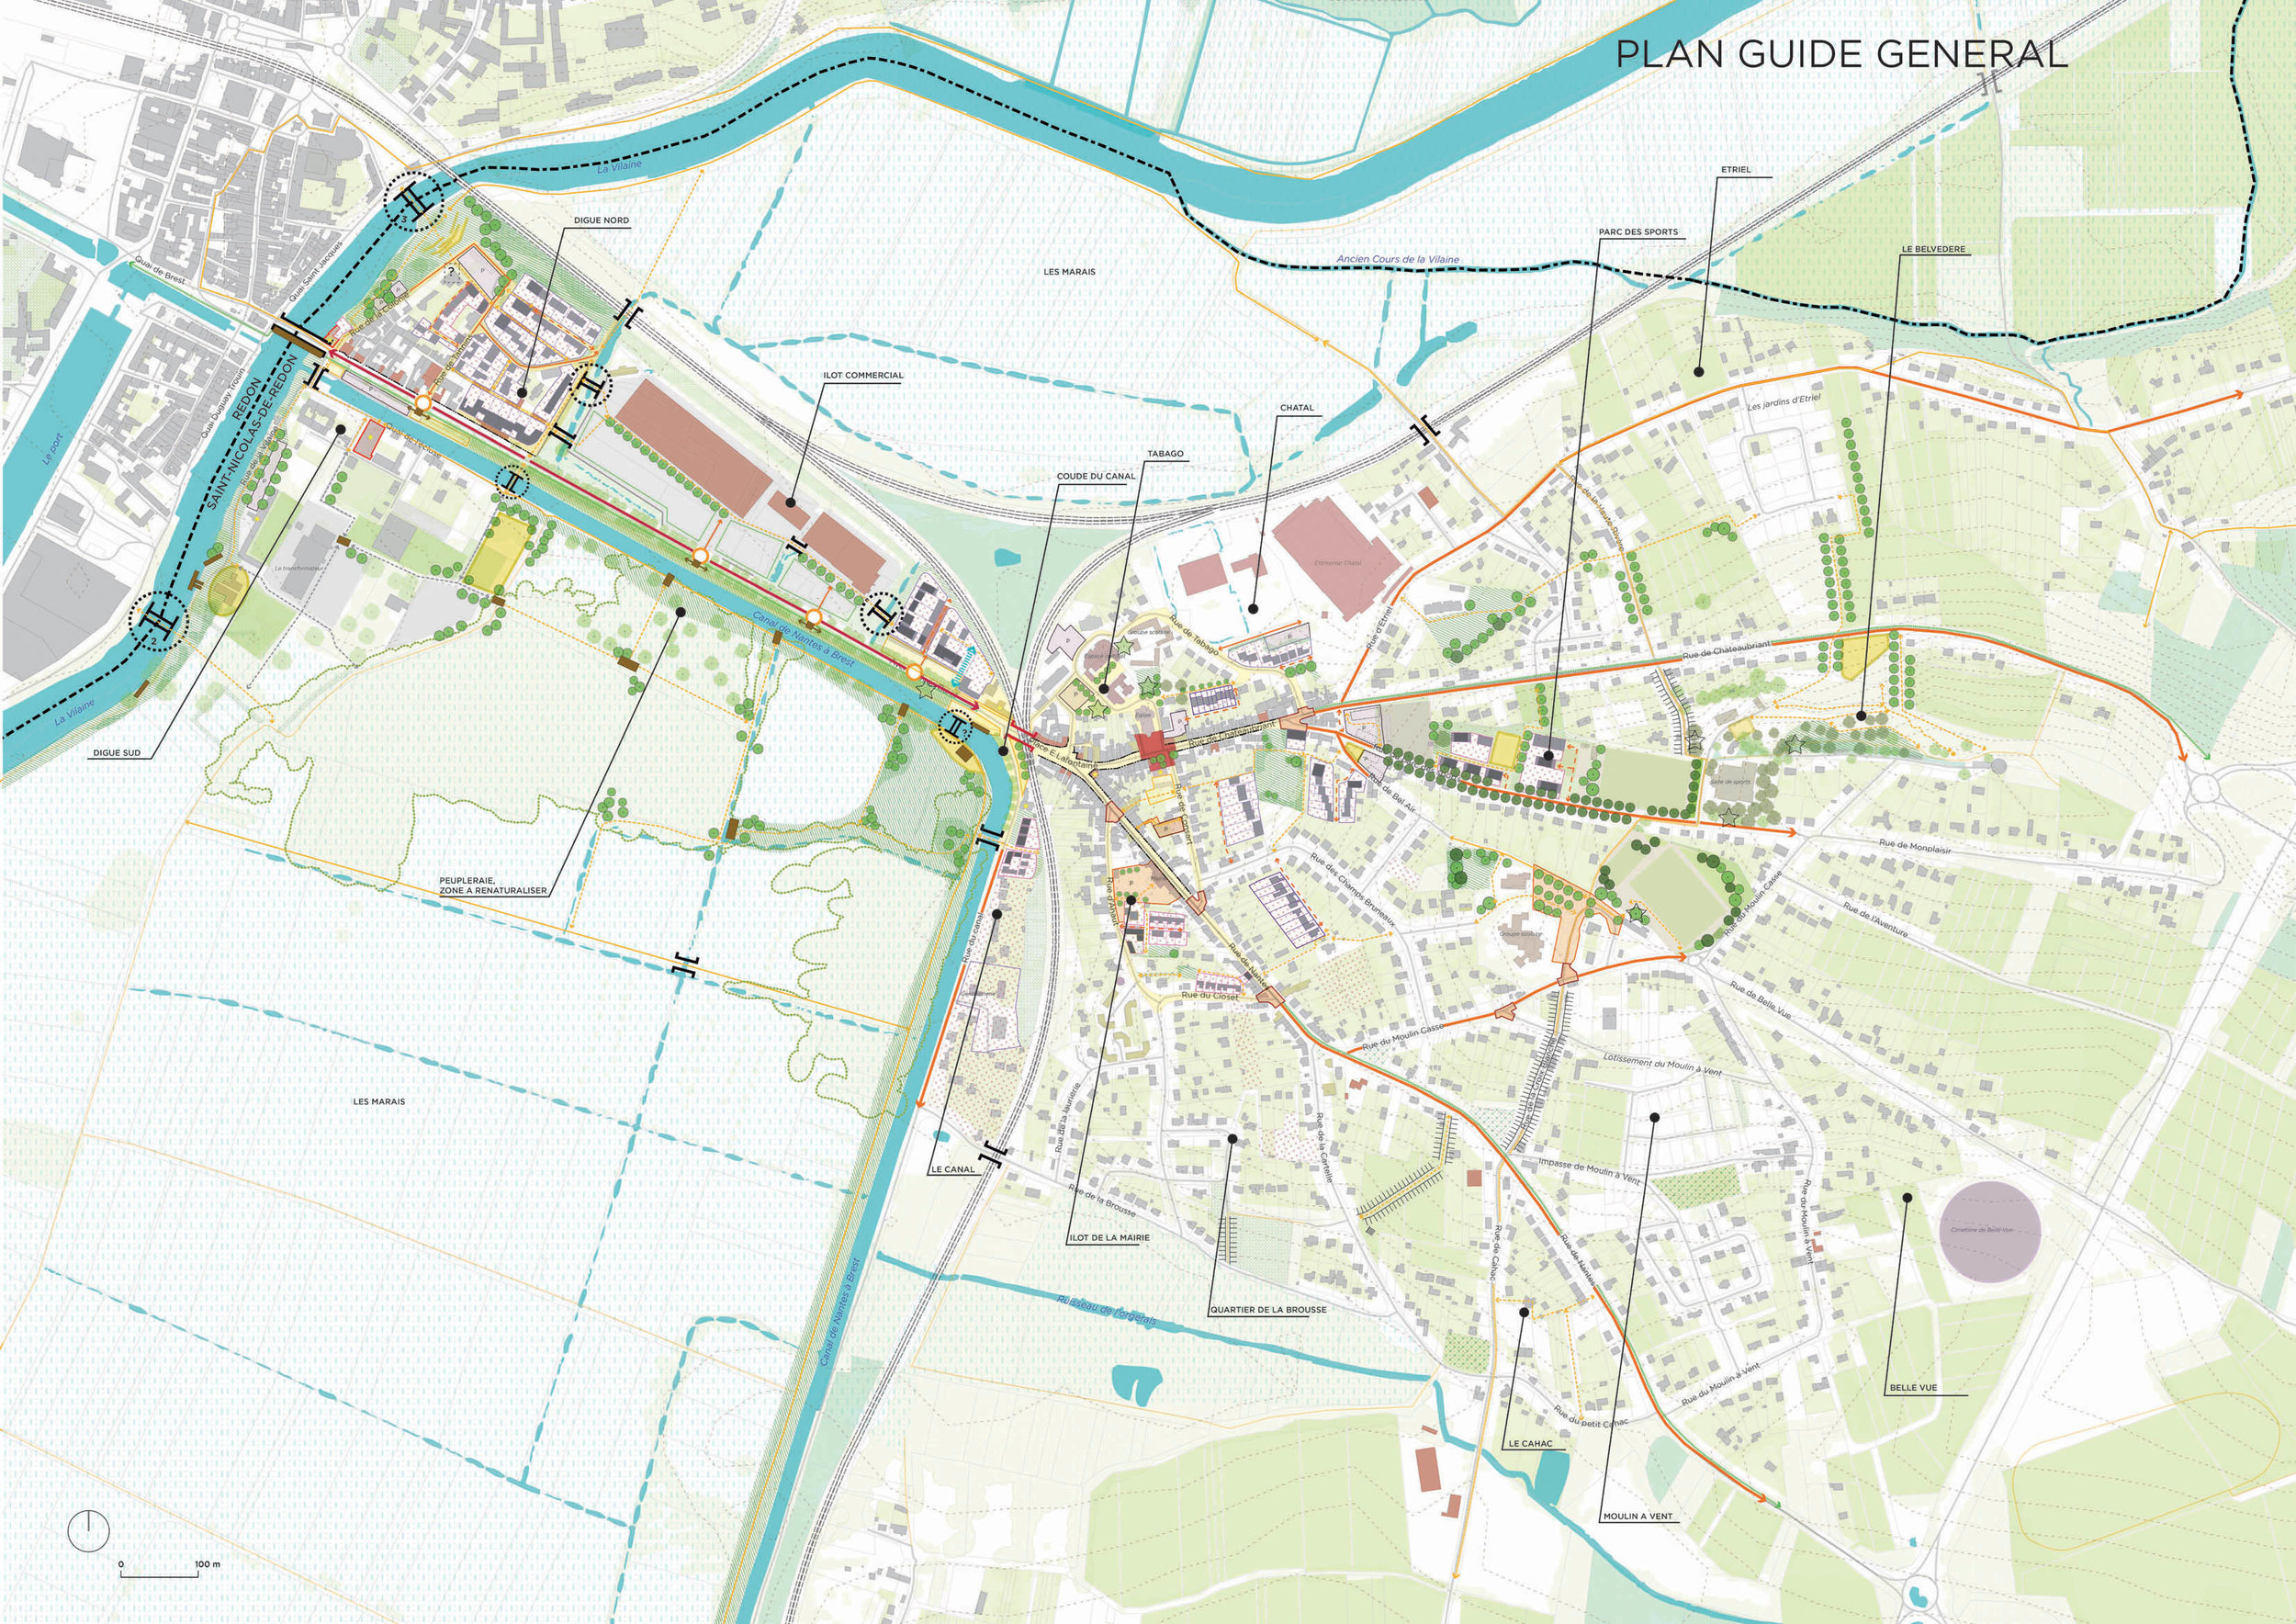 Le plan guide de Saint Nicolas-De-Redon